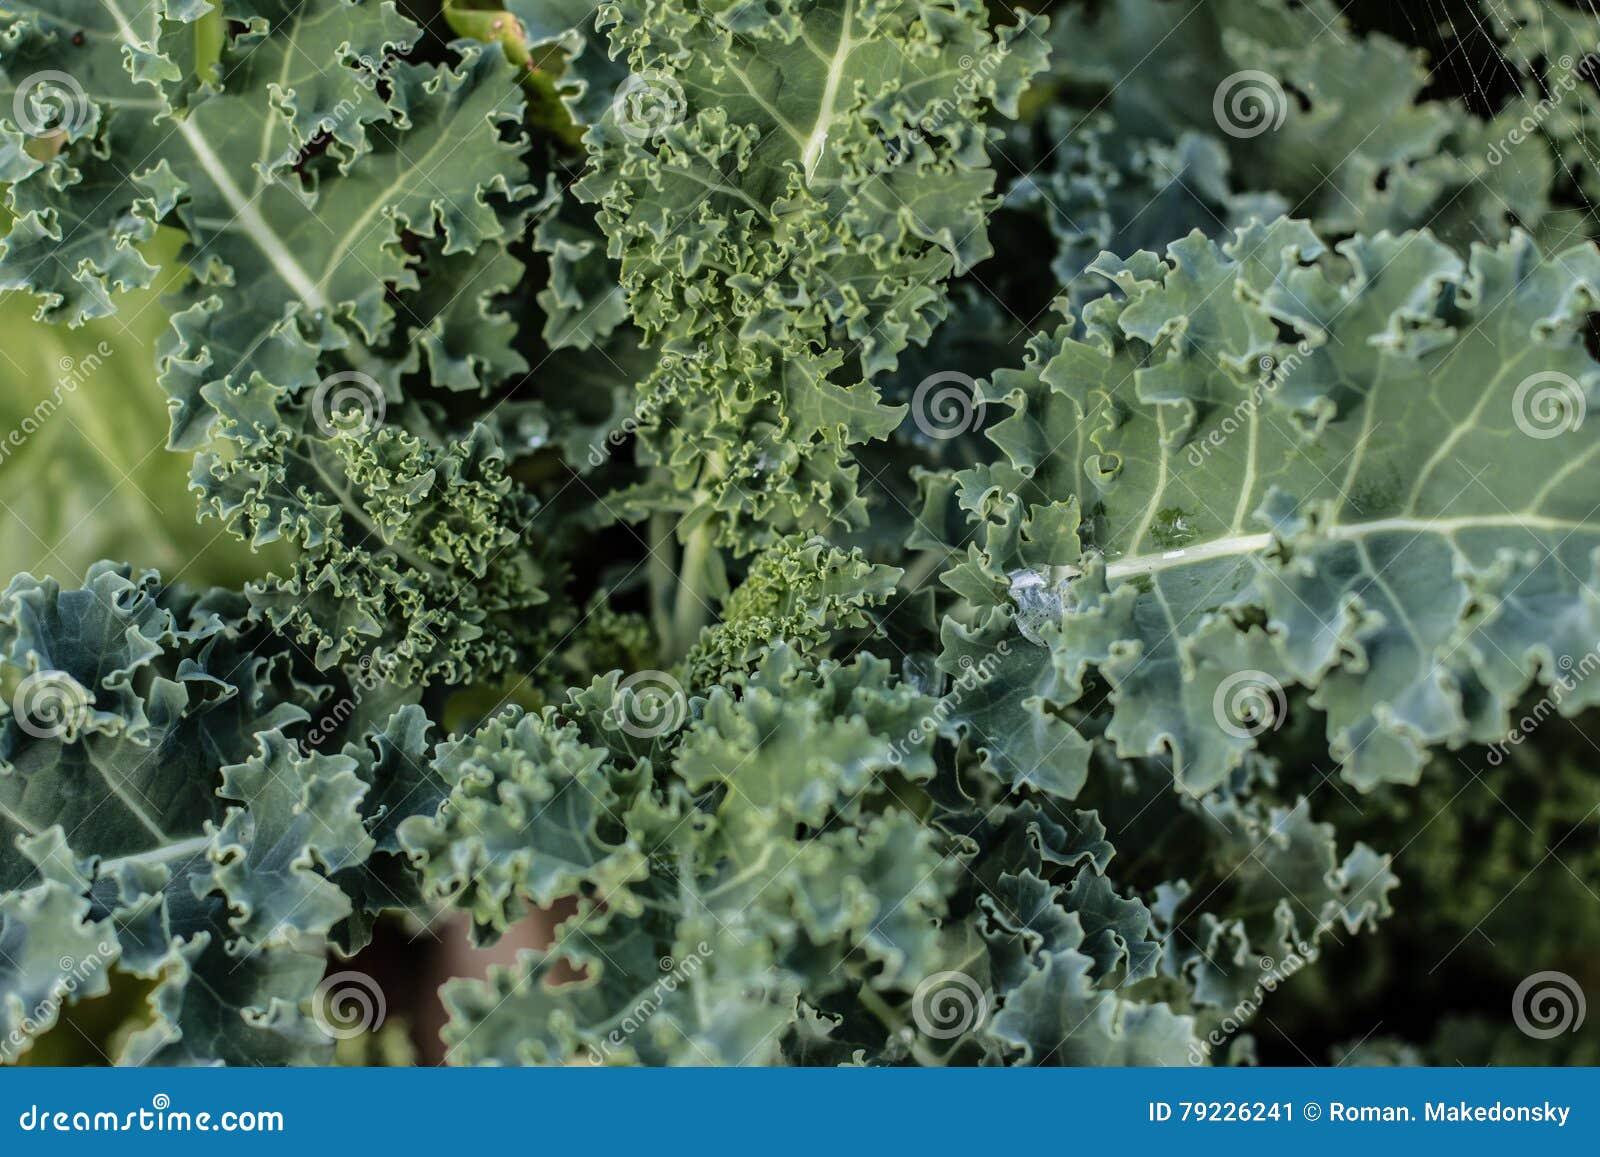 green kale close up stock photo image 79226241